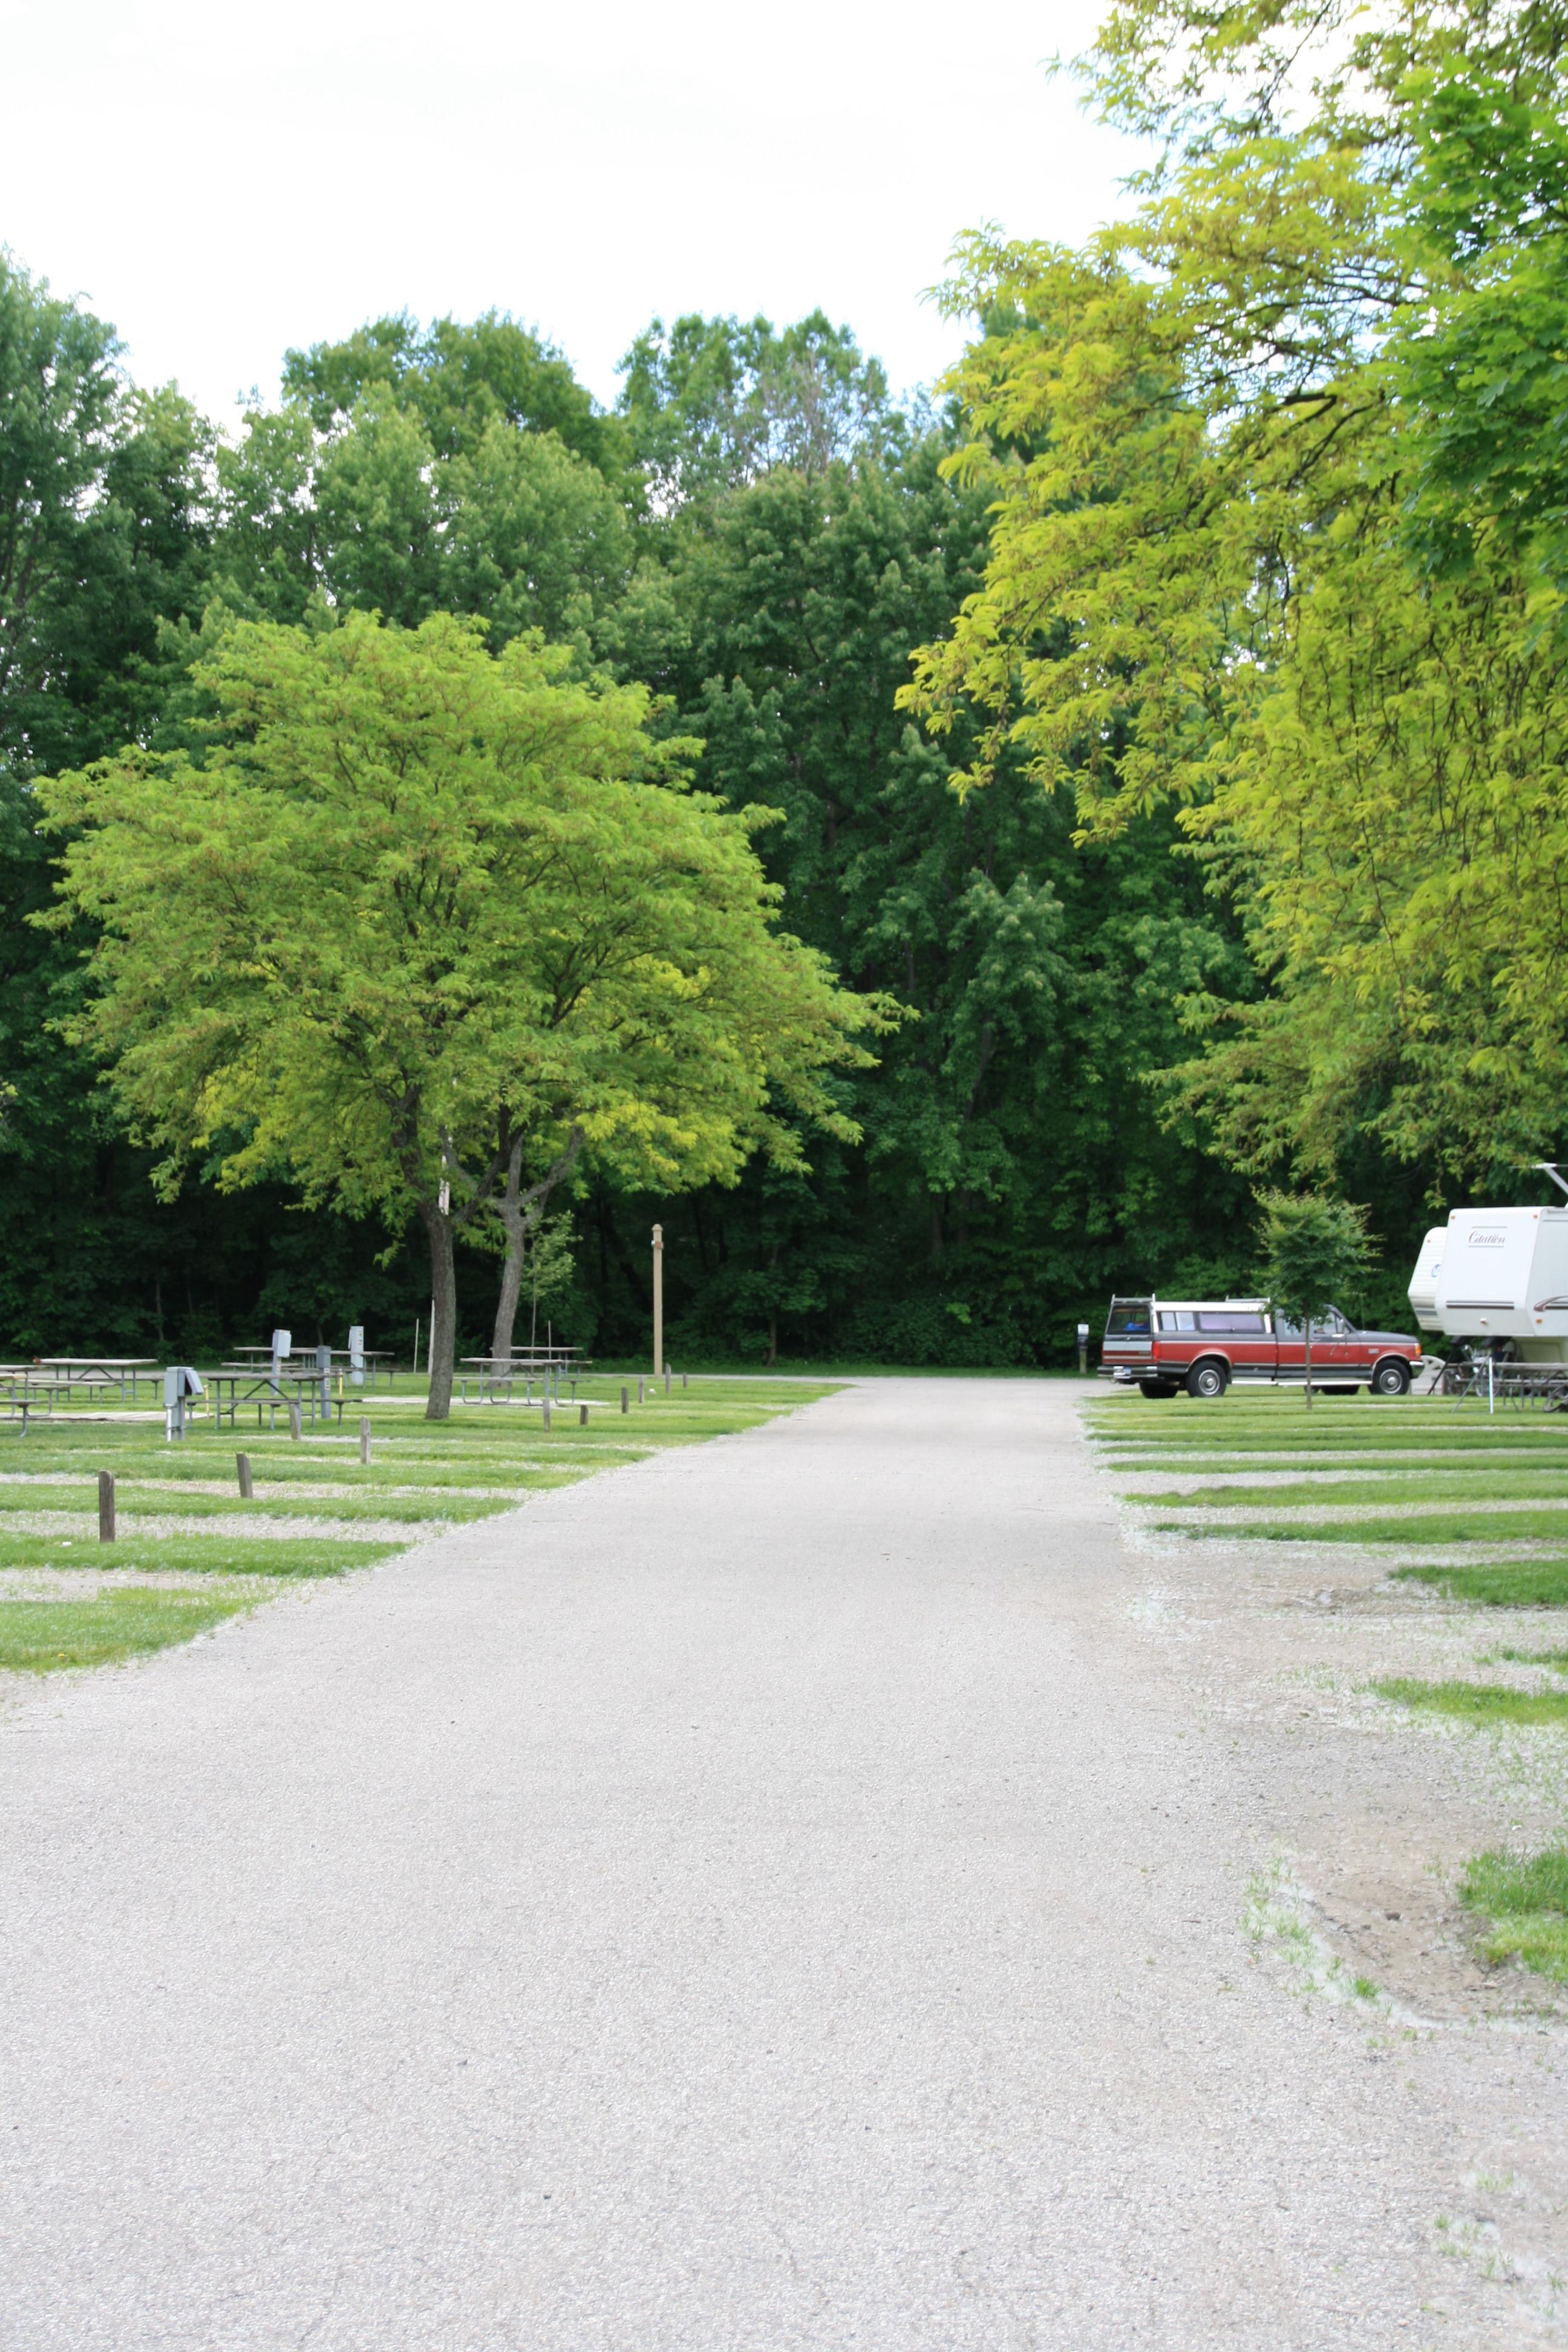 Yogi bear s jellystone park frankenmuth mi crazy4camping for Marshalls cedar park